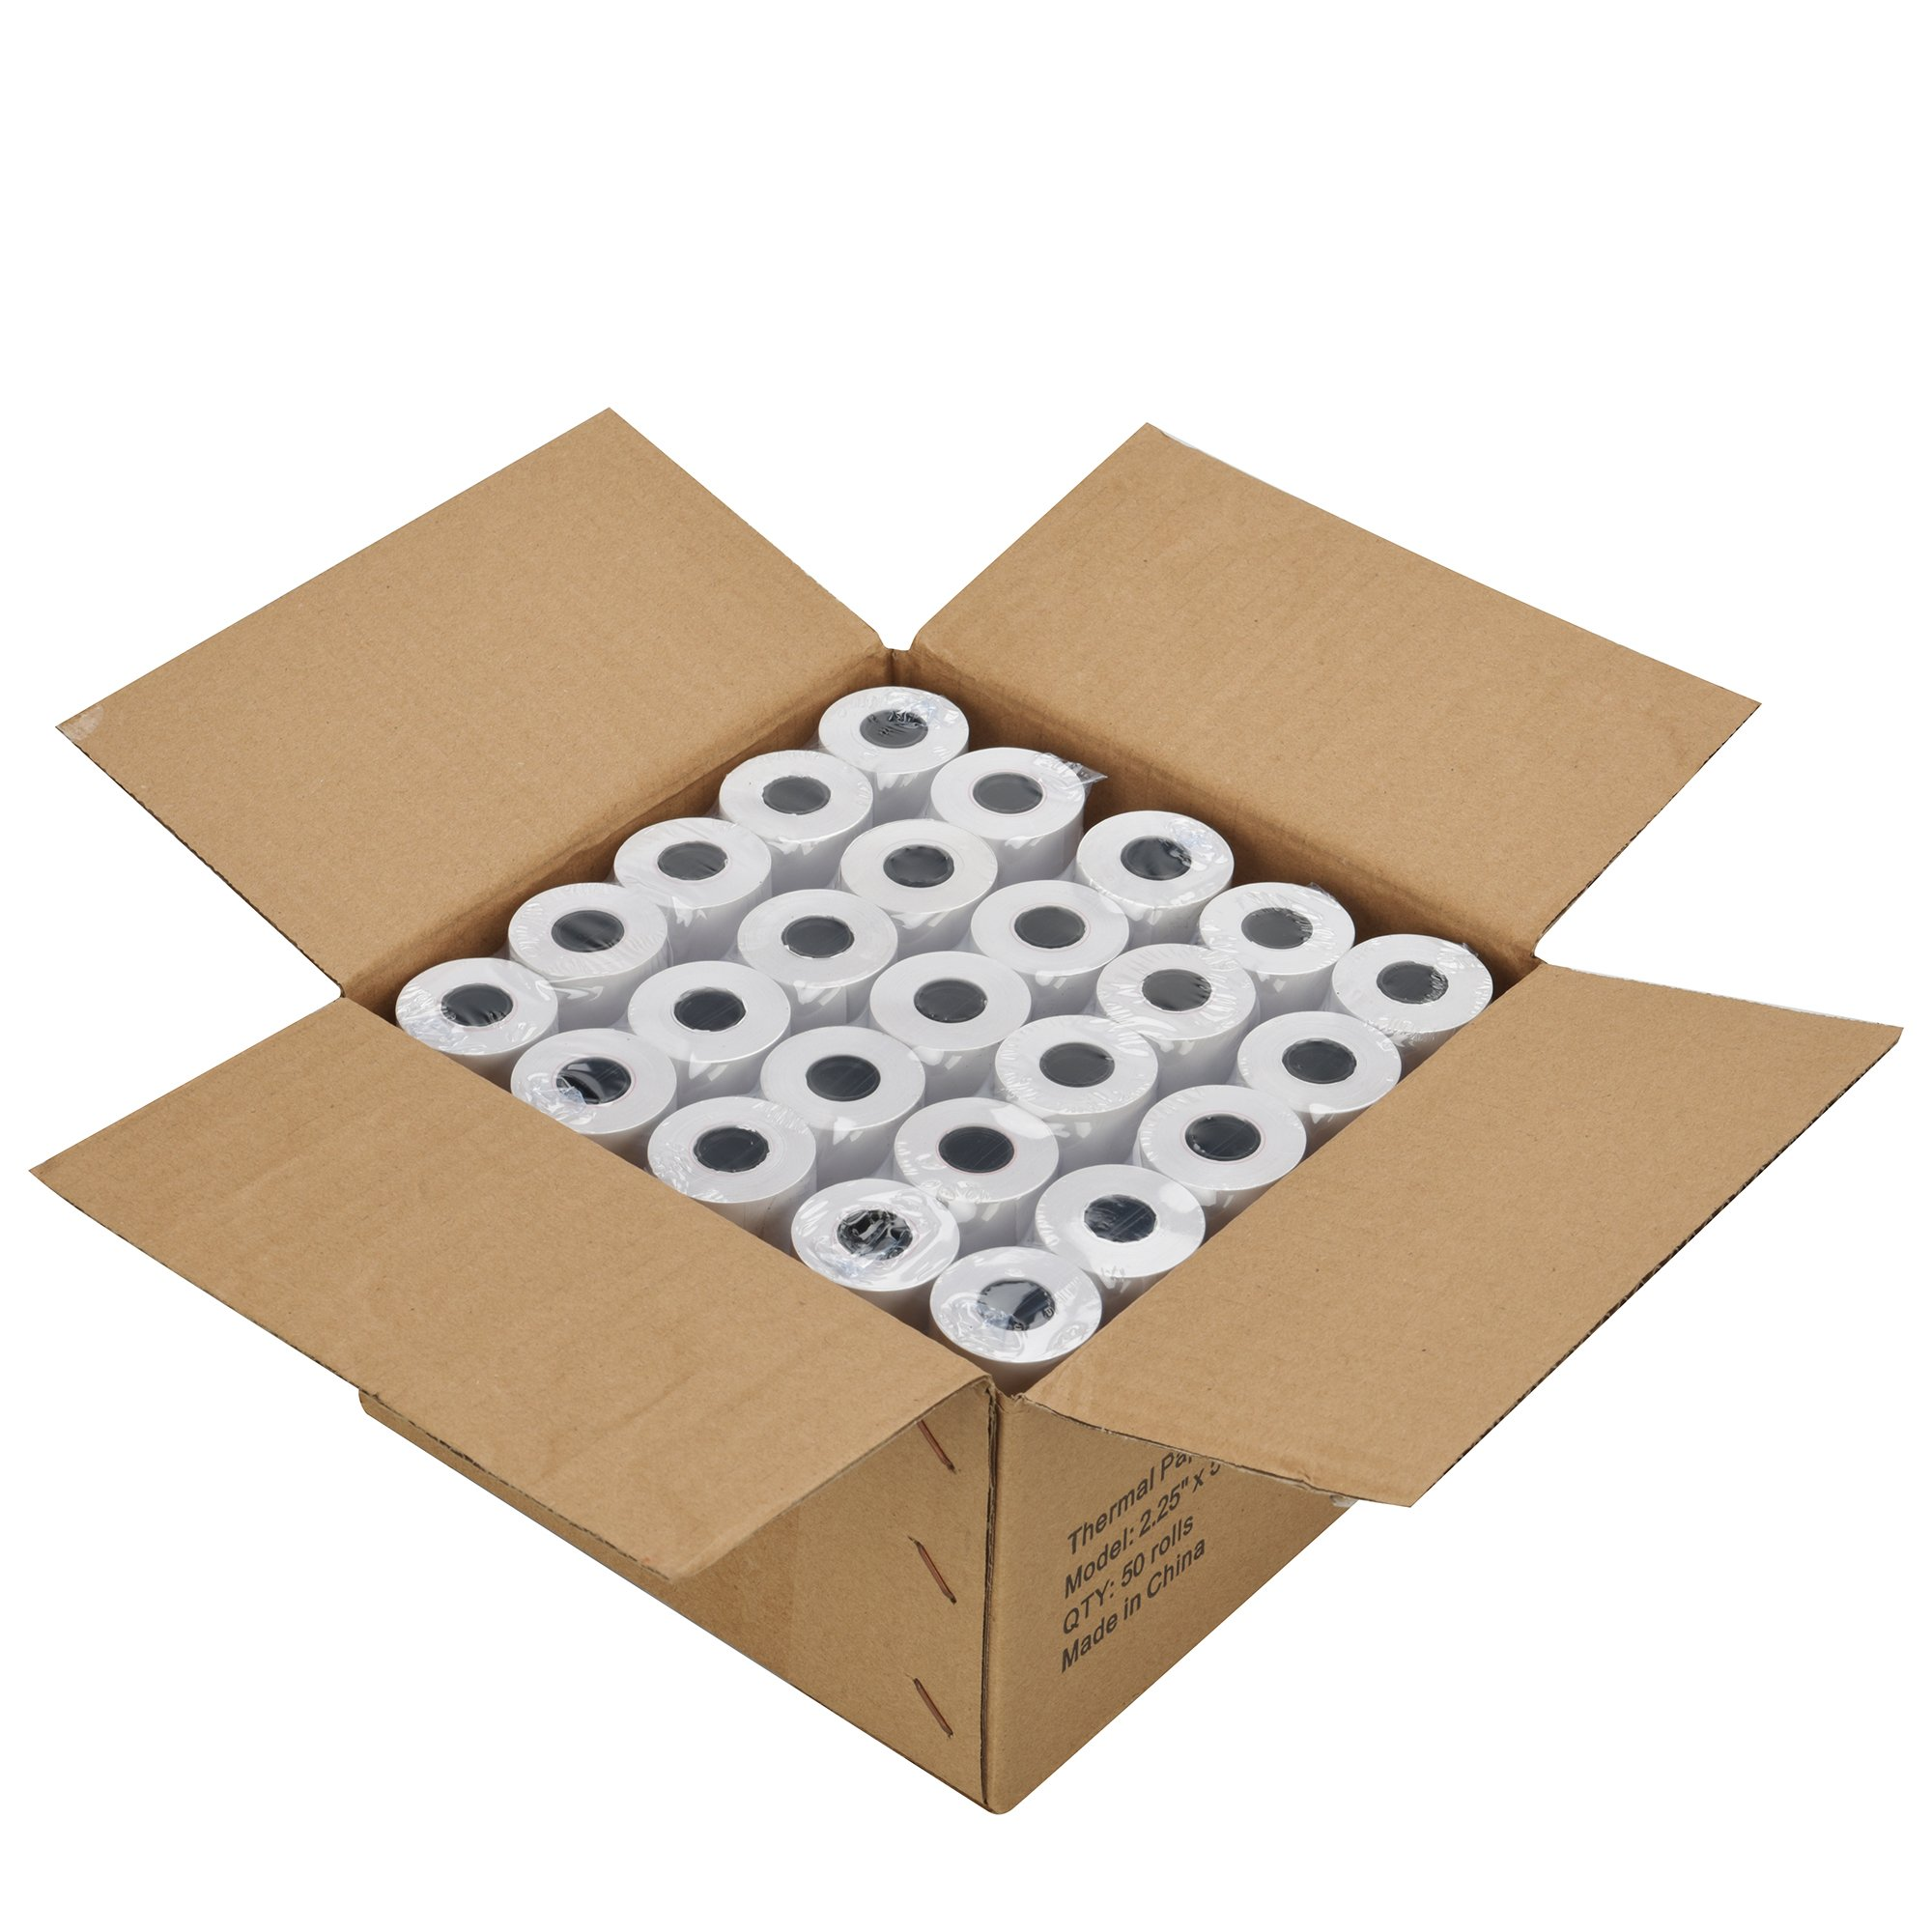 2 1/4'' x 50' Thermal Receipt Paper, Cash Register POS Paper Roll, 50 Rolls Total